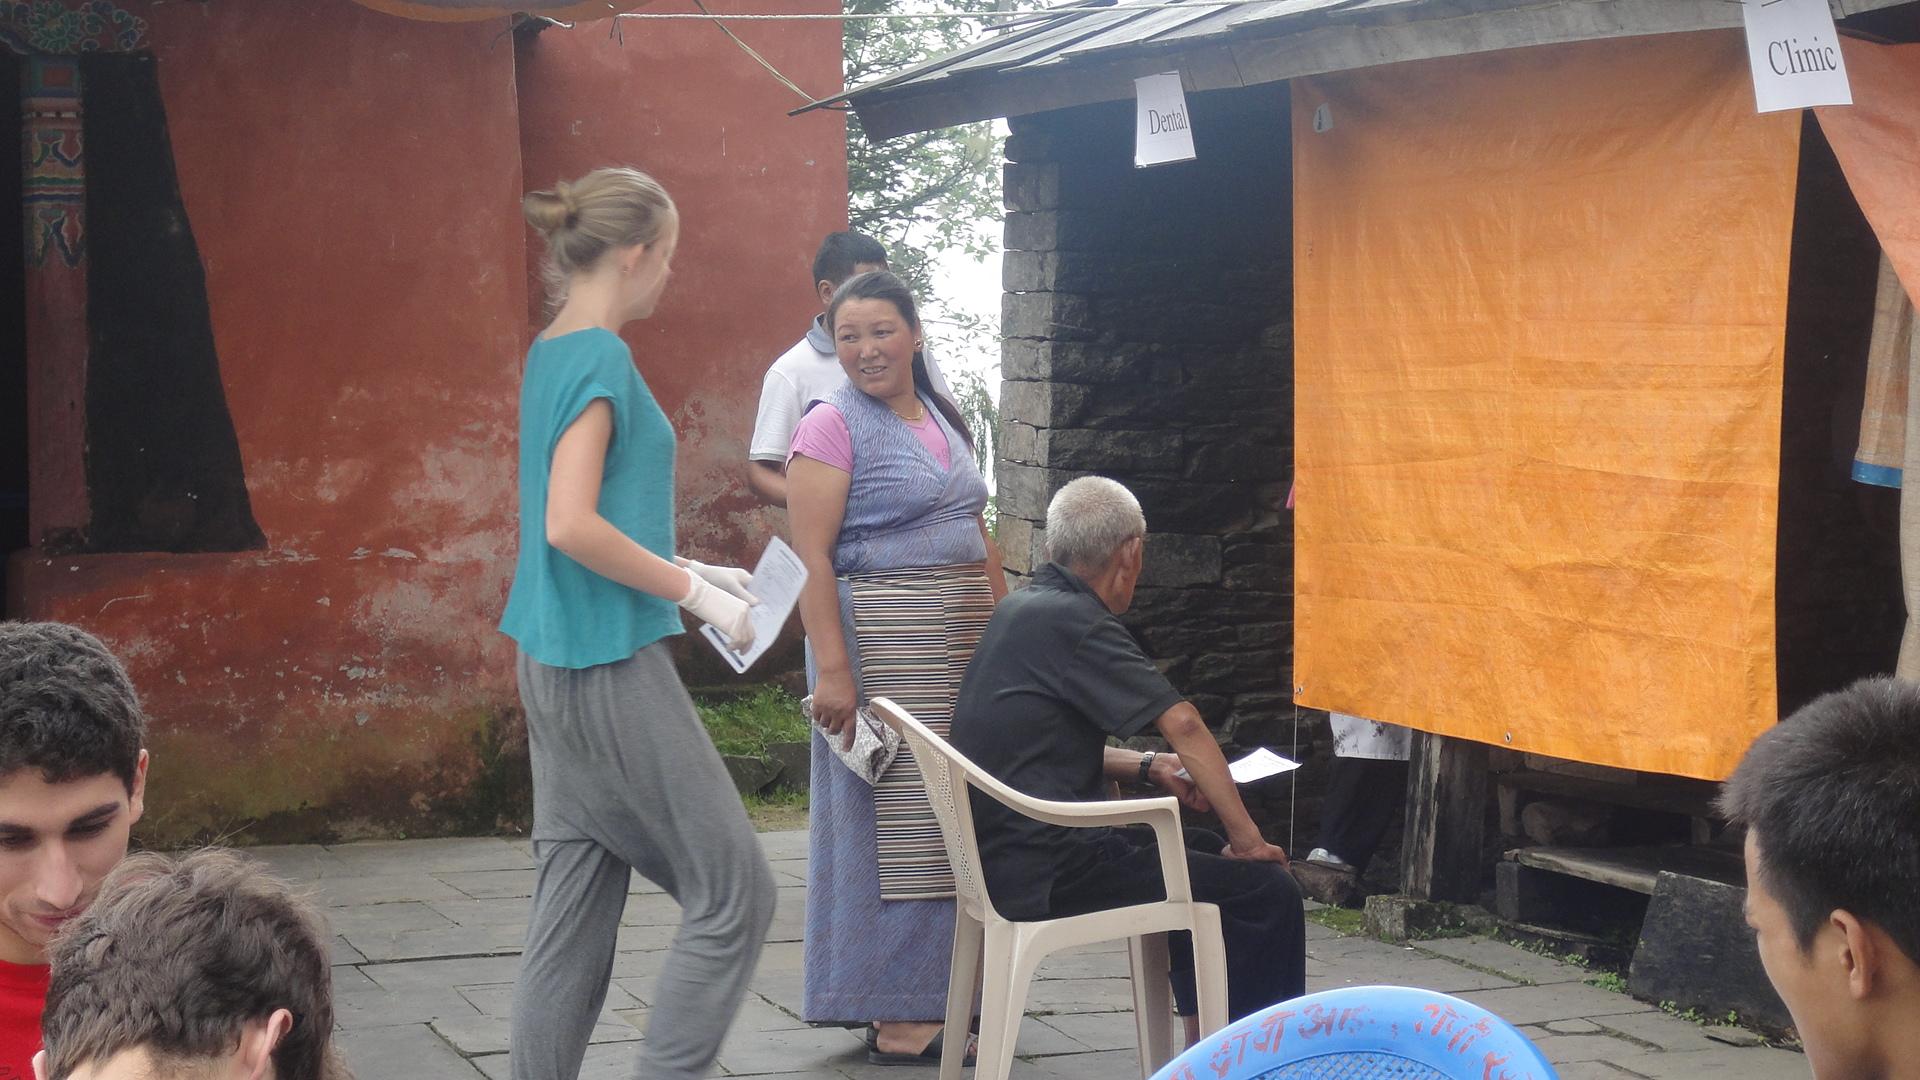 Medical_Student_Volunteering_Adventure_Alternative_Nepal.JPG